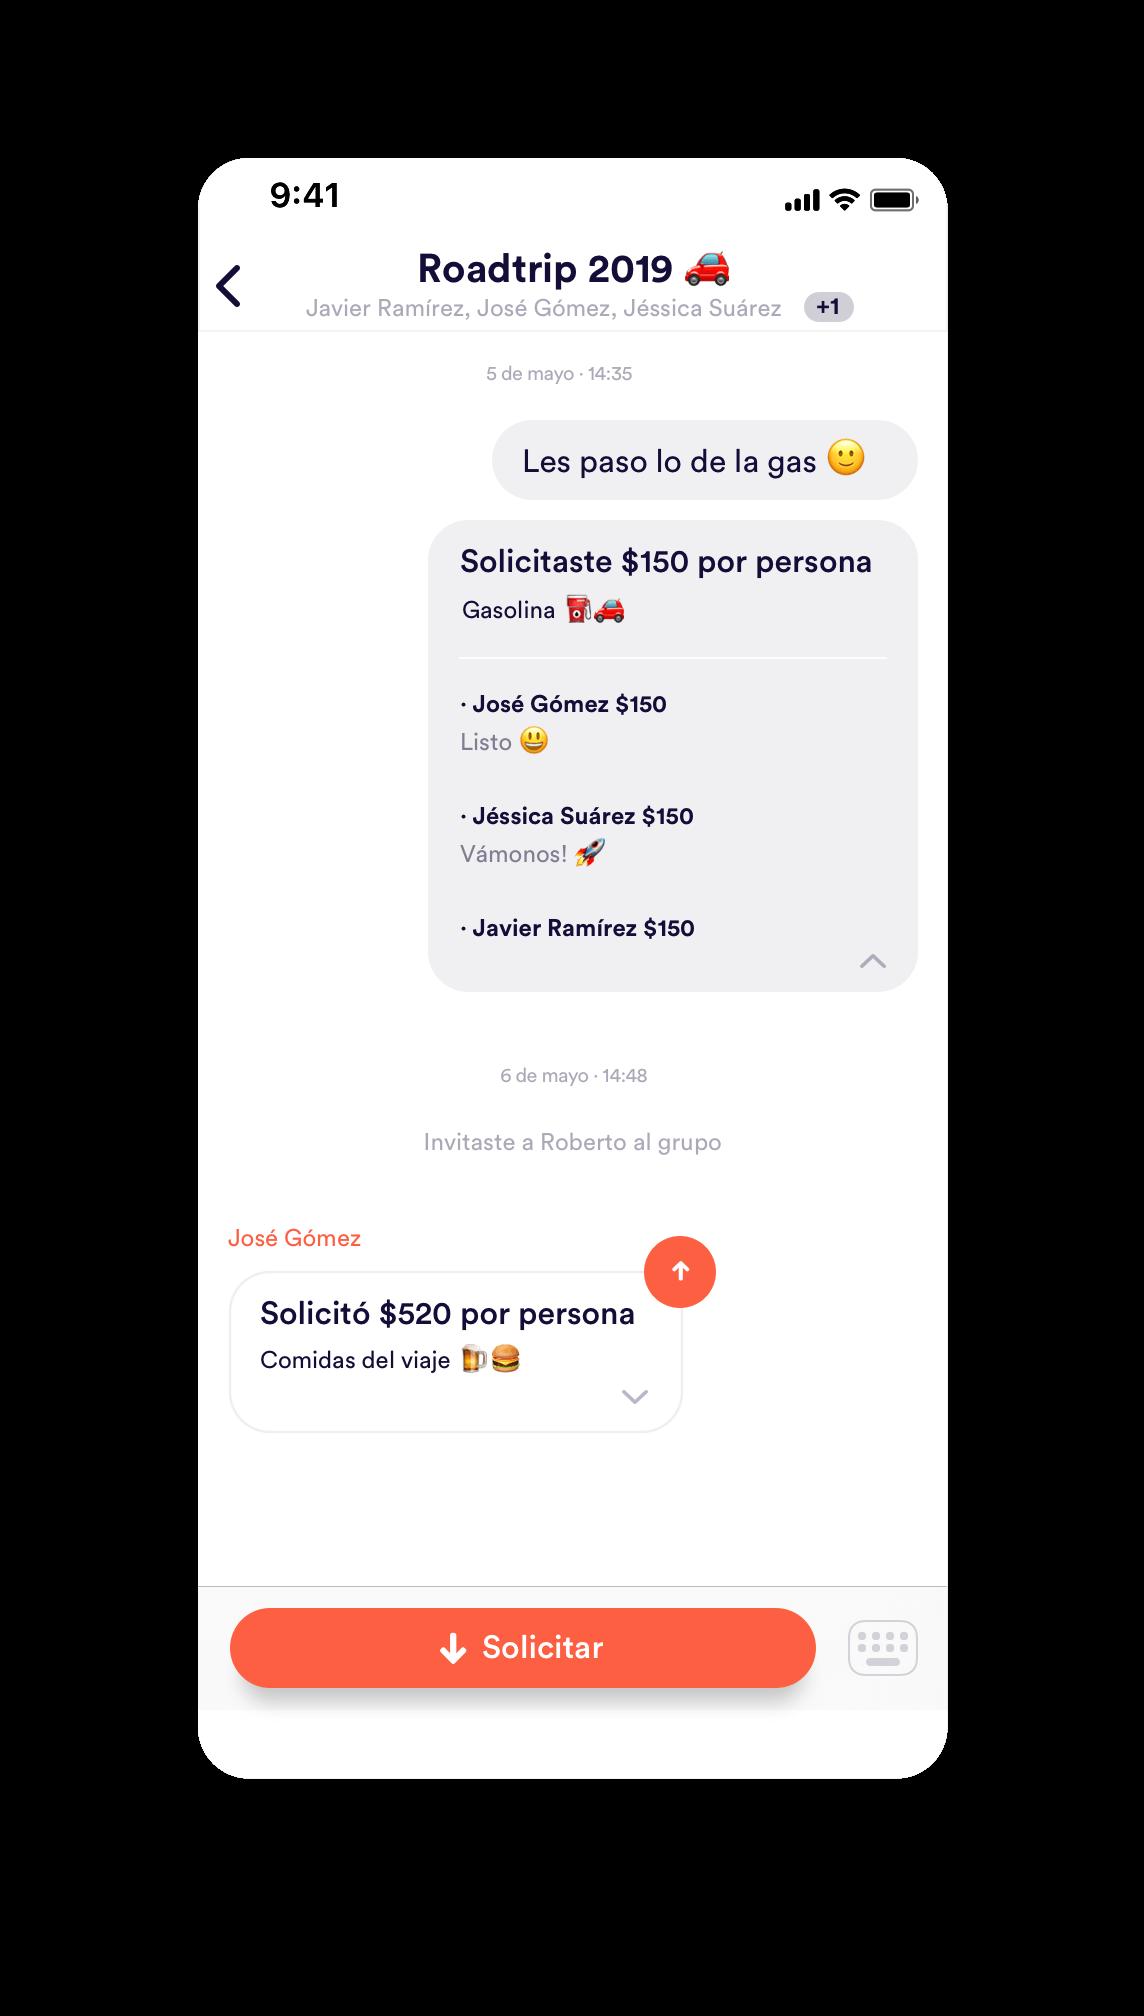 app-screen-viaje-1